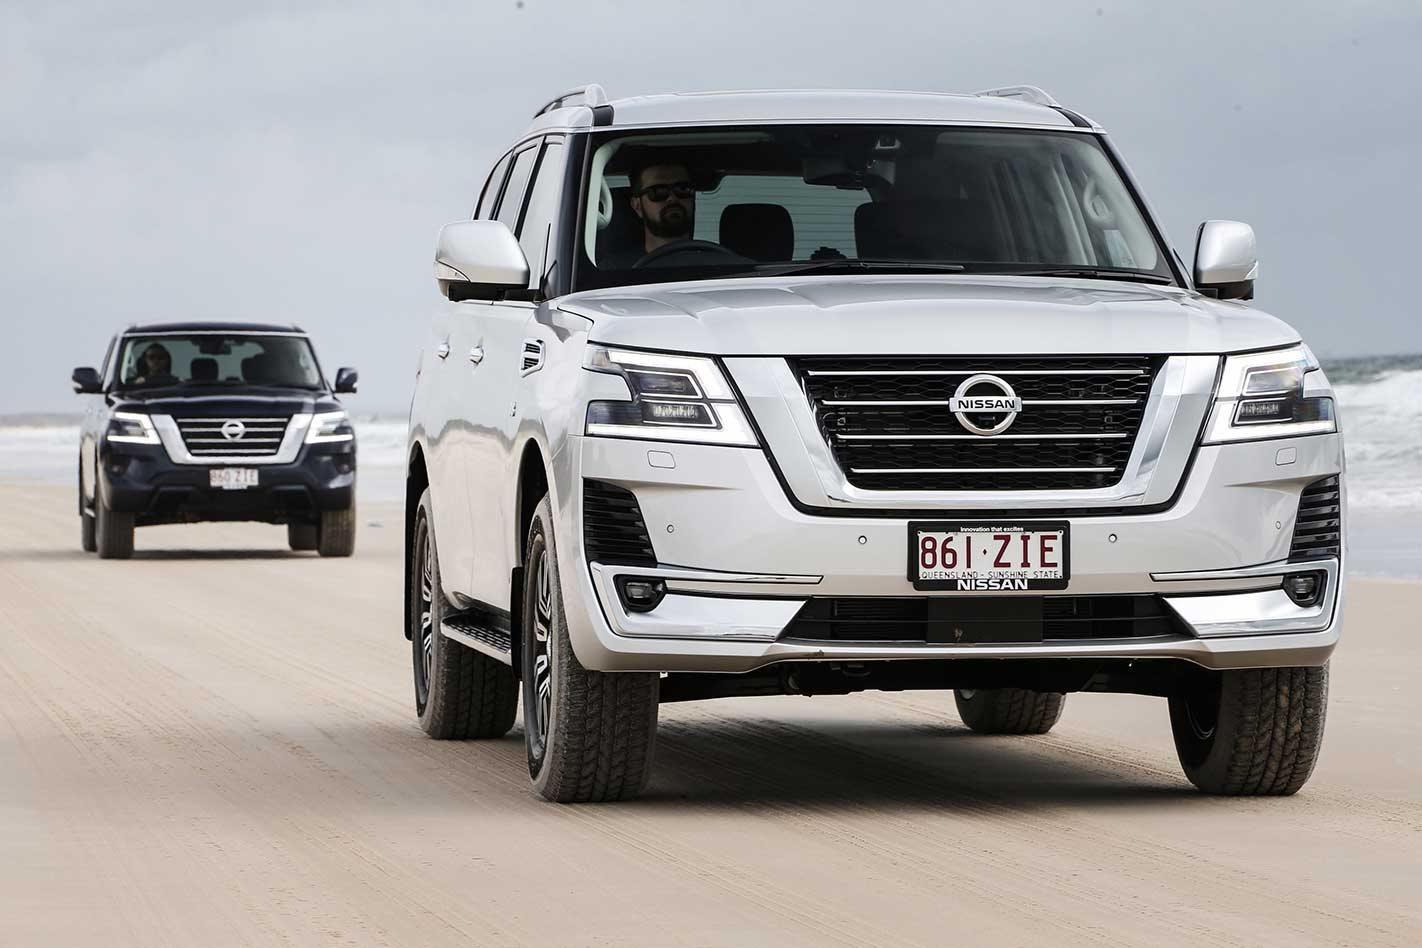 2020-Nissan-Patrol-Australia-pricing.jpg